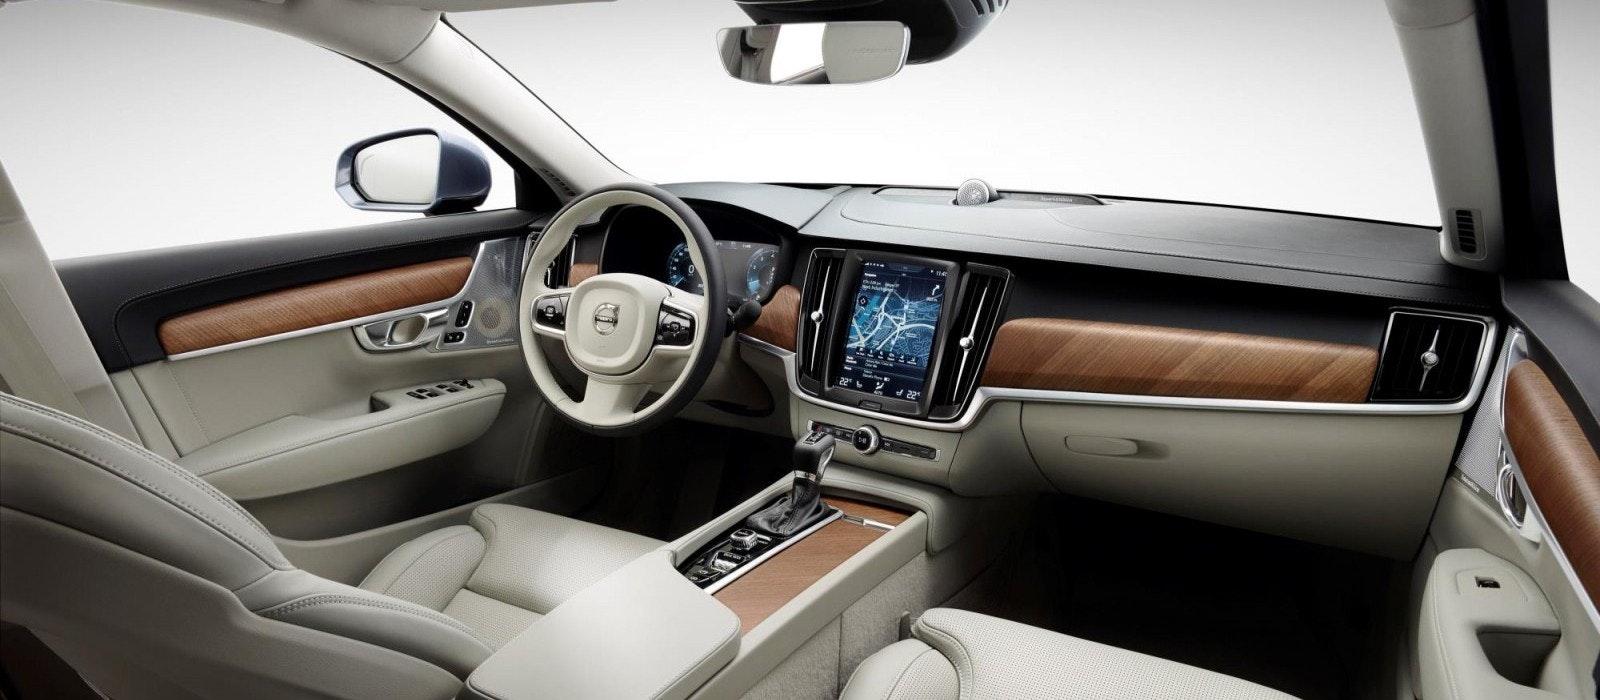 Volvo s90 size